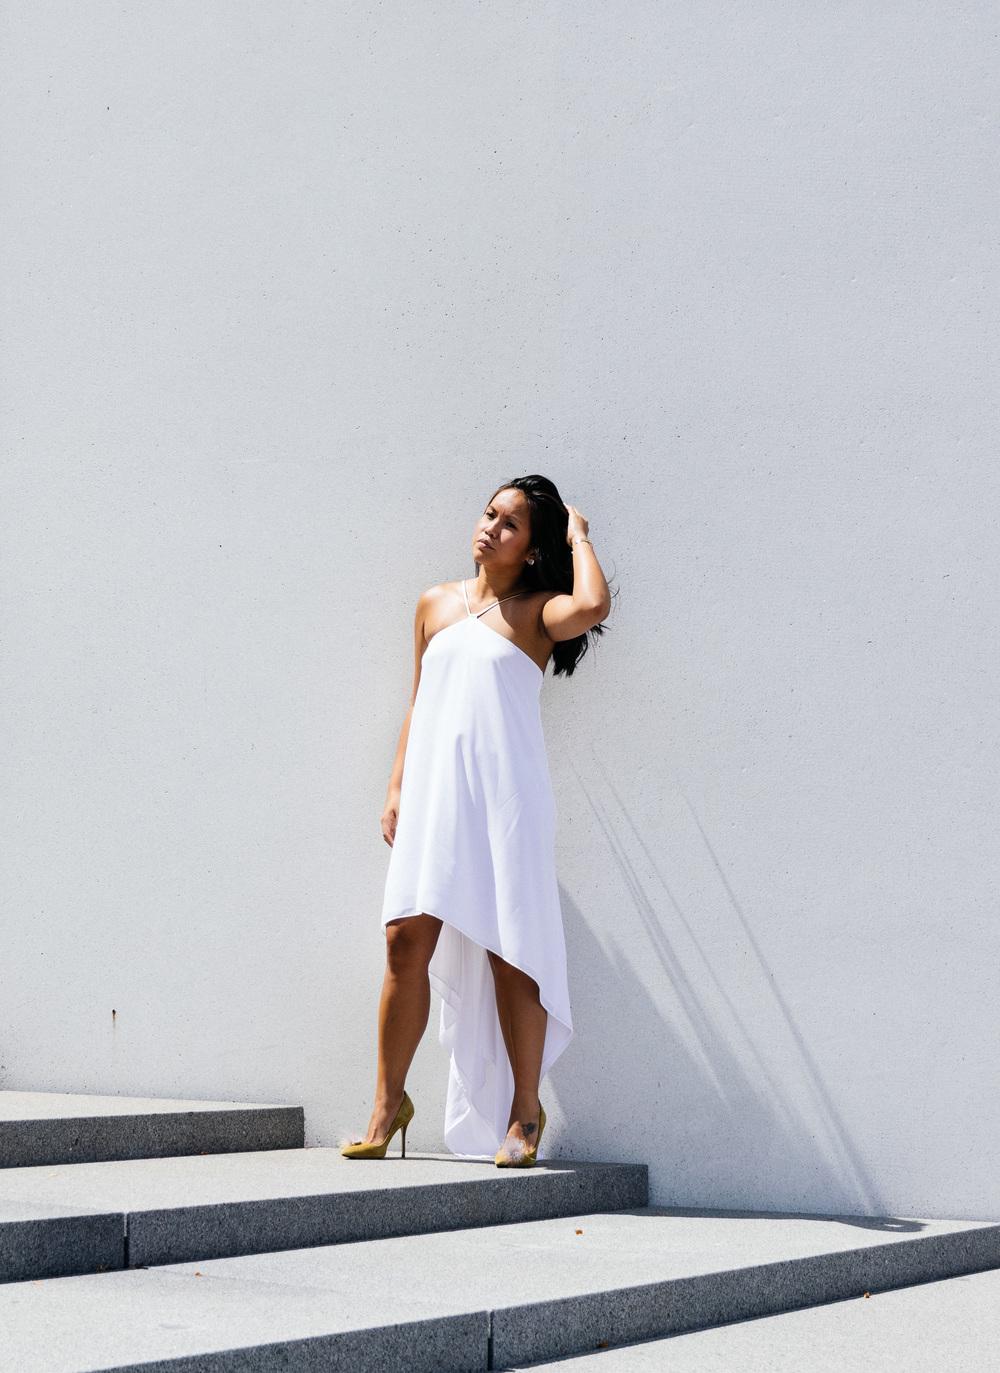 dress: express, shoes: jcrew photo by brenda phan